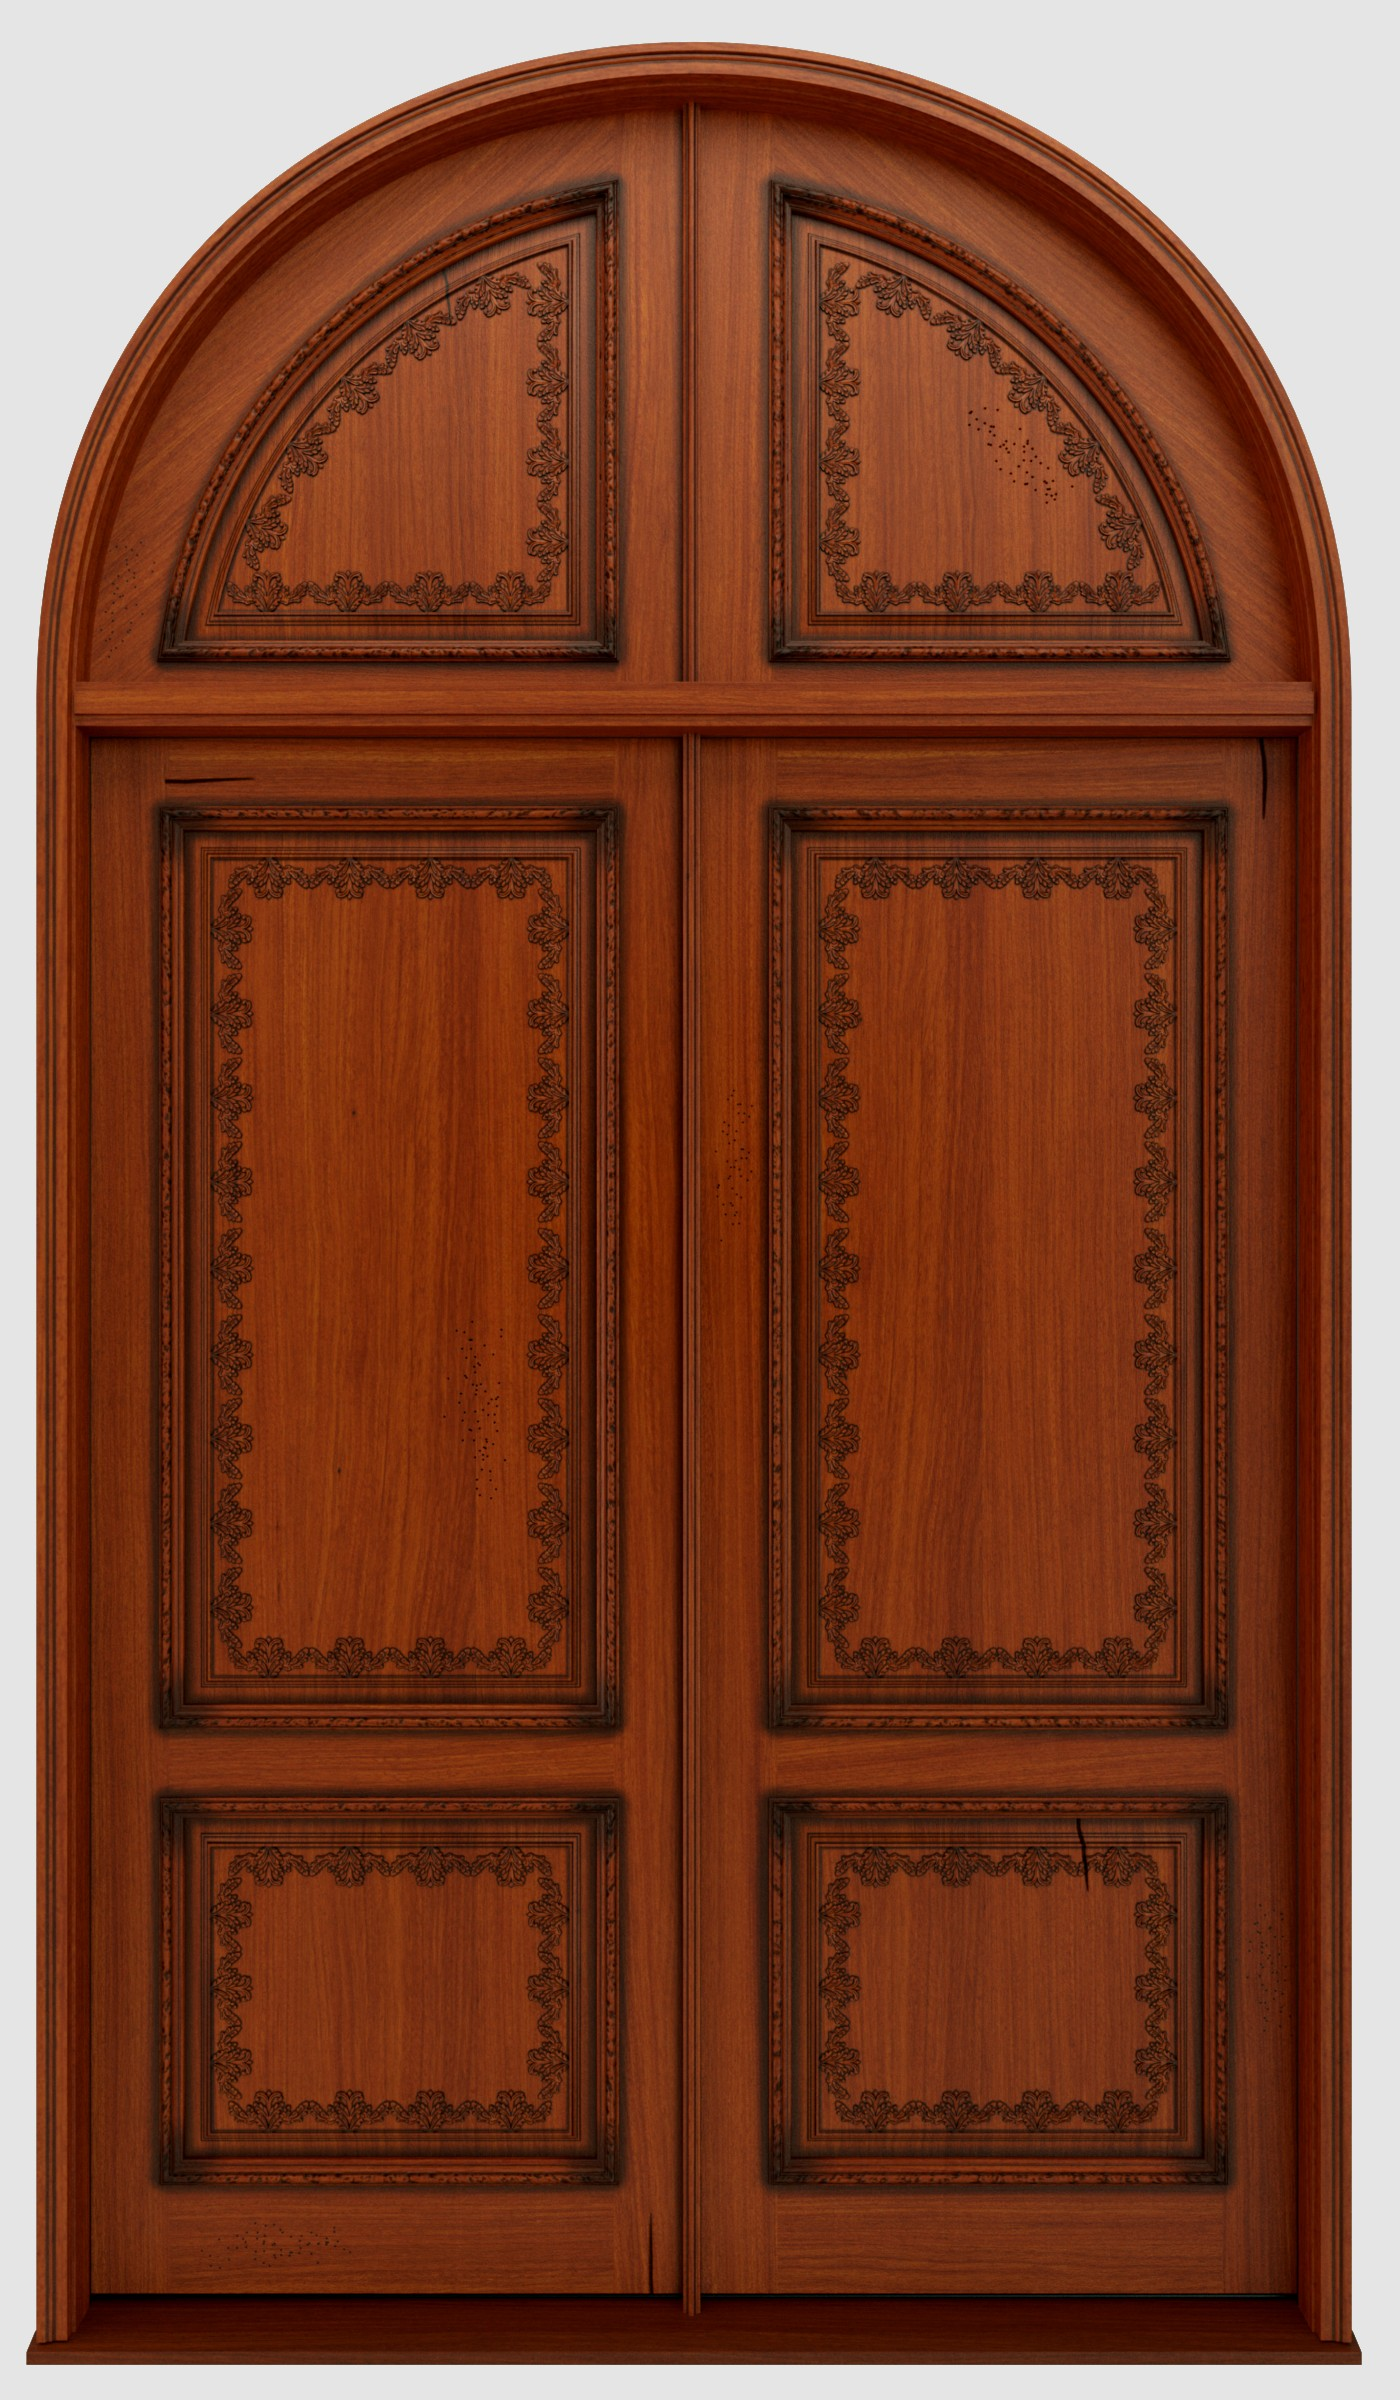 Carved Doors  Hand Carved Doors  U0026 Wood Carved Doors